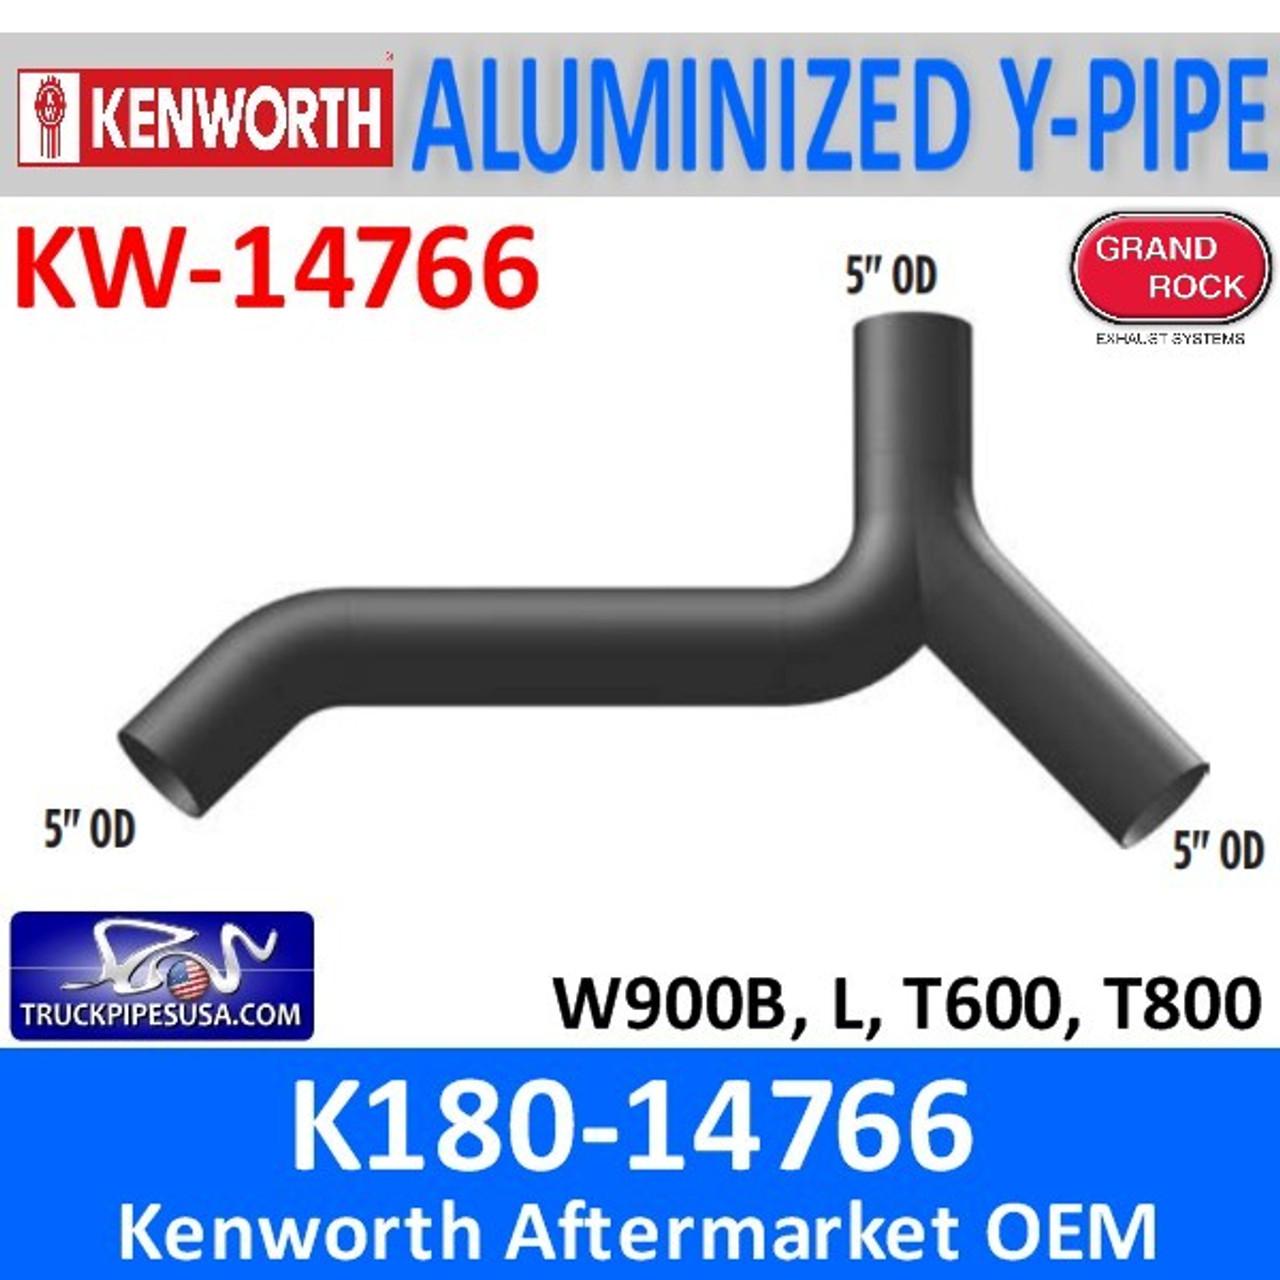 K180-14766-Kenworth-Truck-Exhaust-Ypipe-